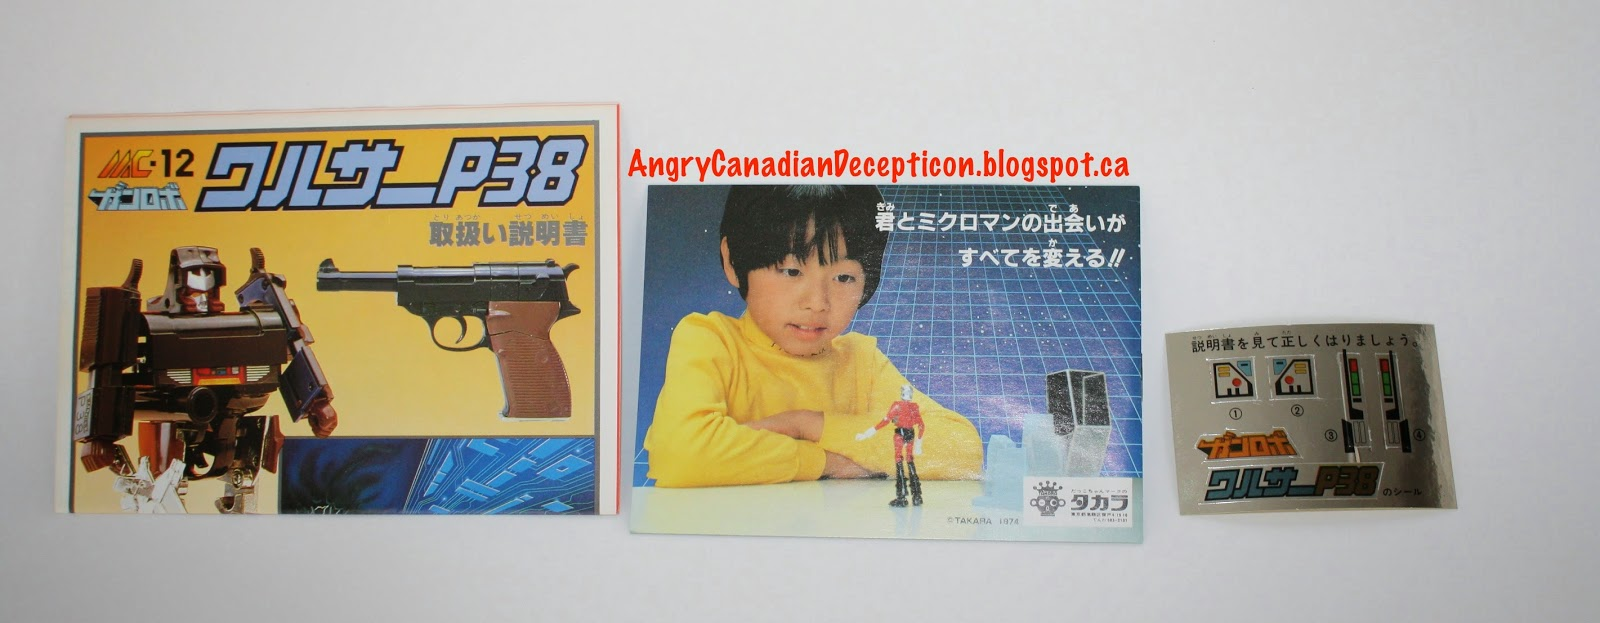 Microman Megatron'S Toy 15